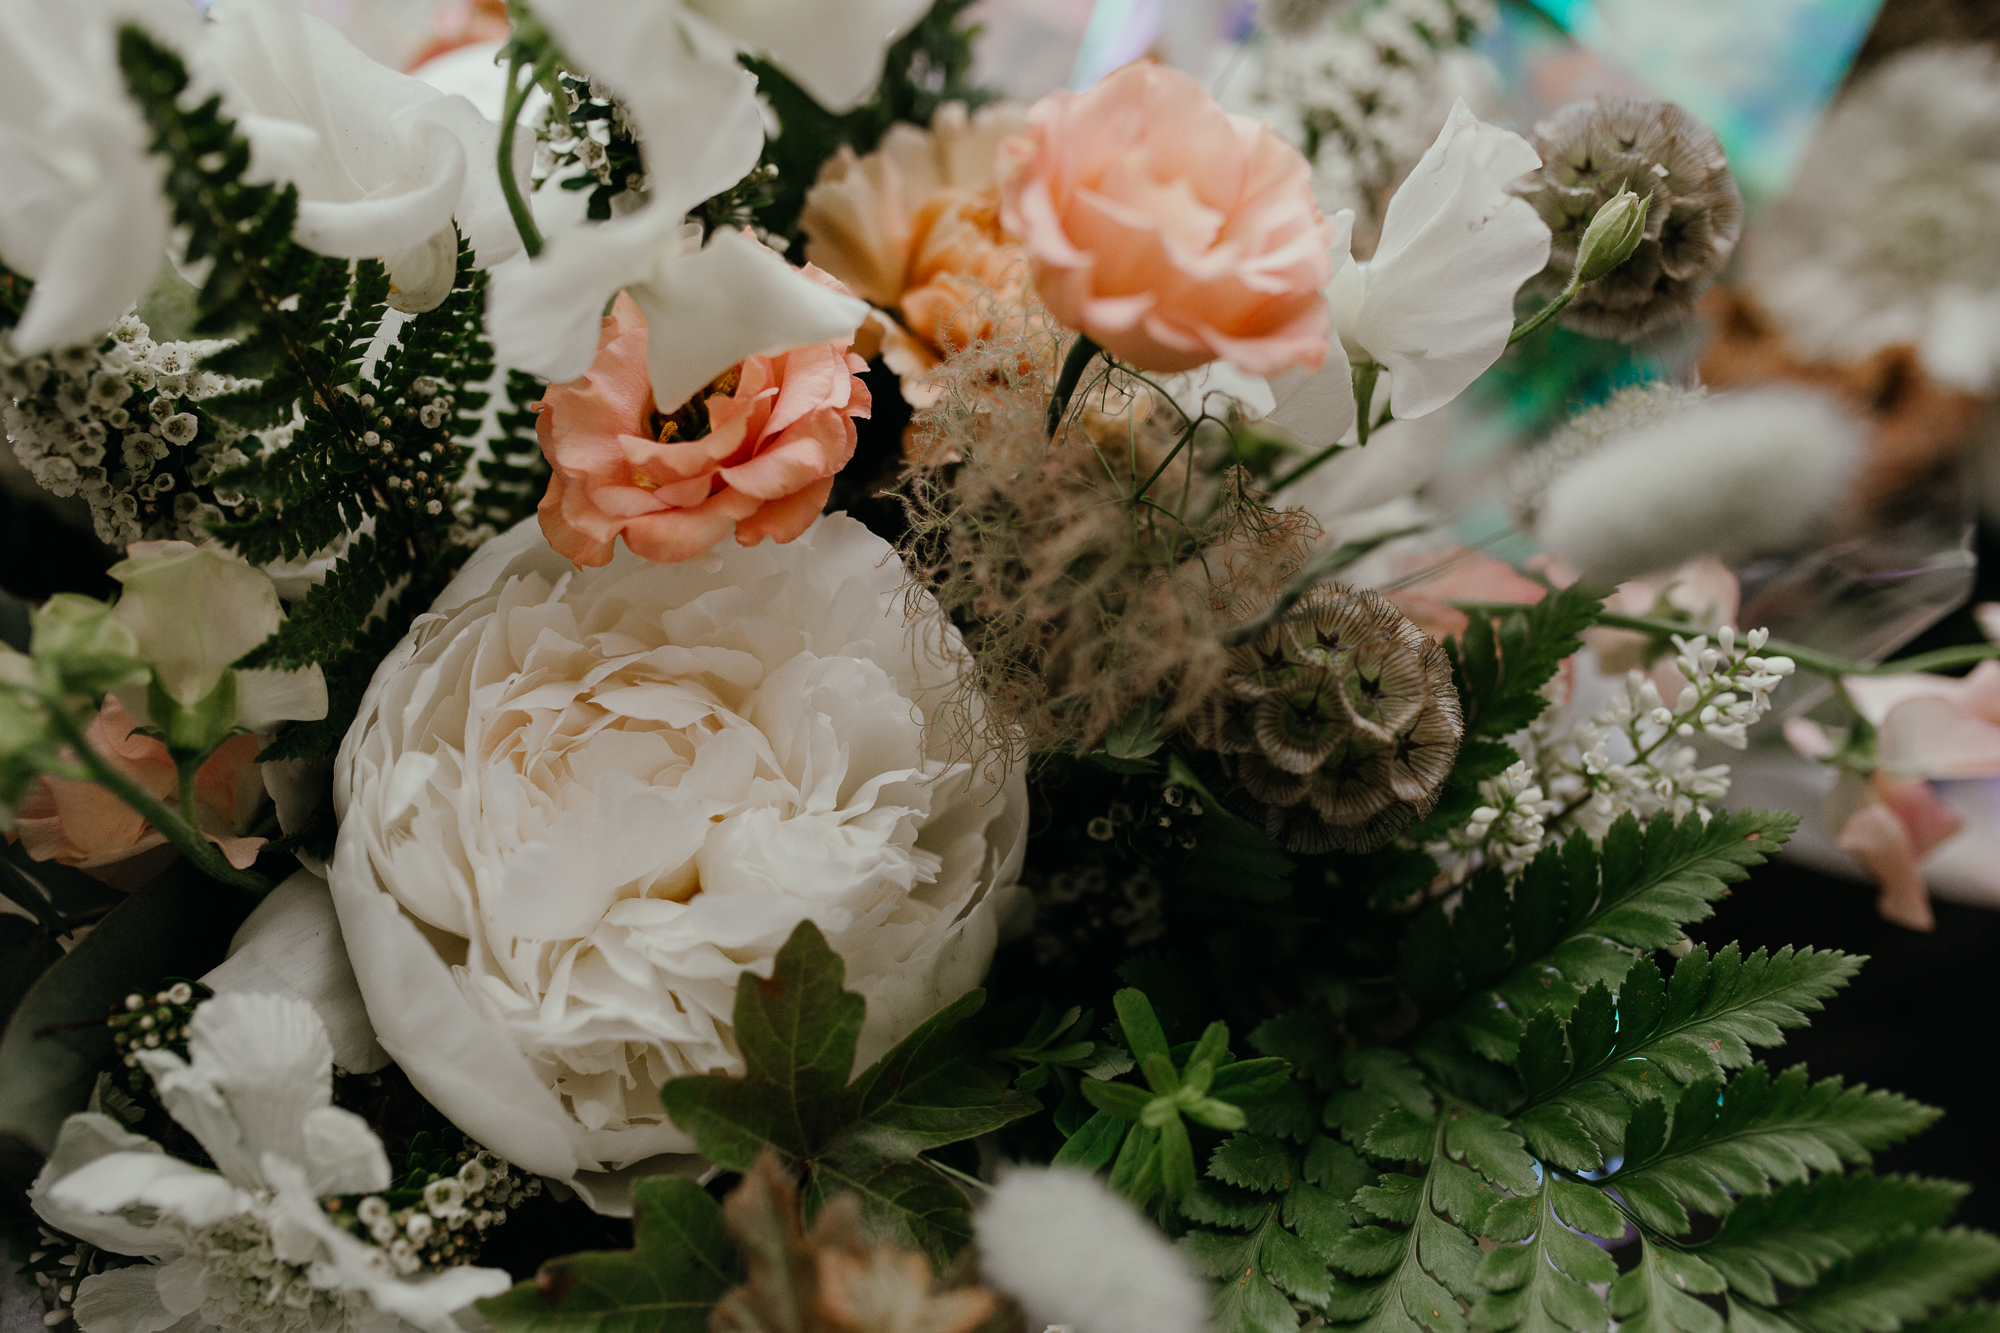 stephanie-green-wedding-photography-sulaflowers-sula-flowers-london-islington-town-hall-depot-n7-9.jpg